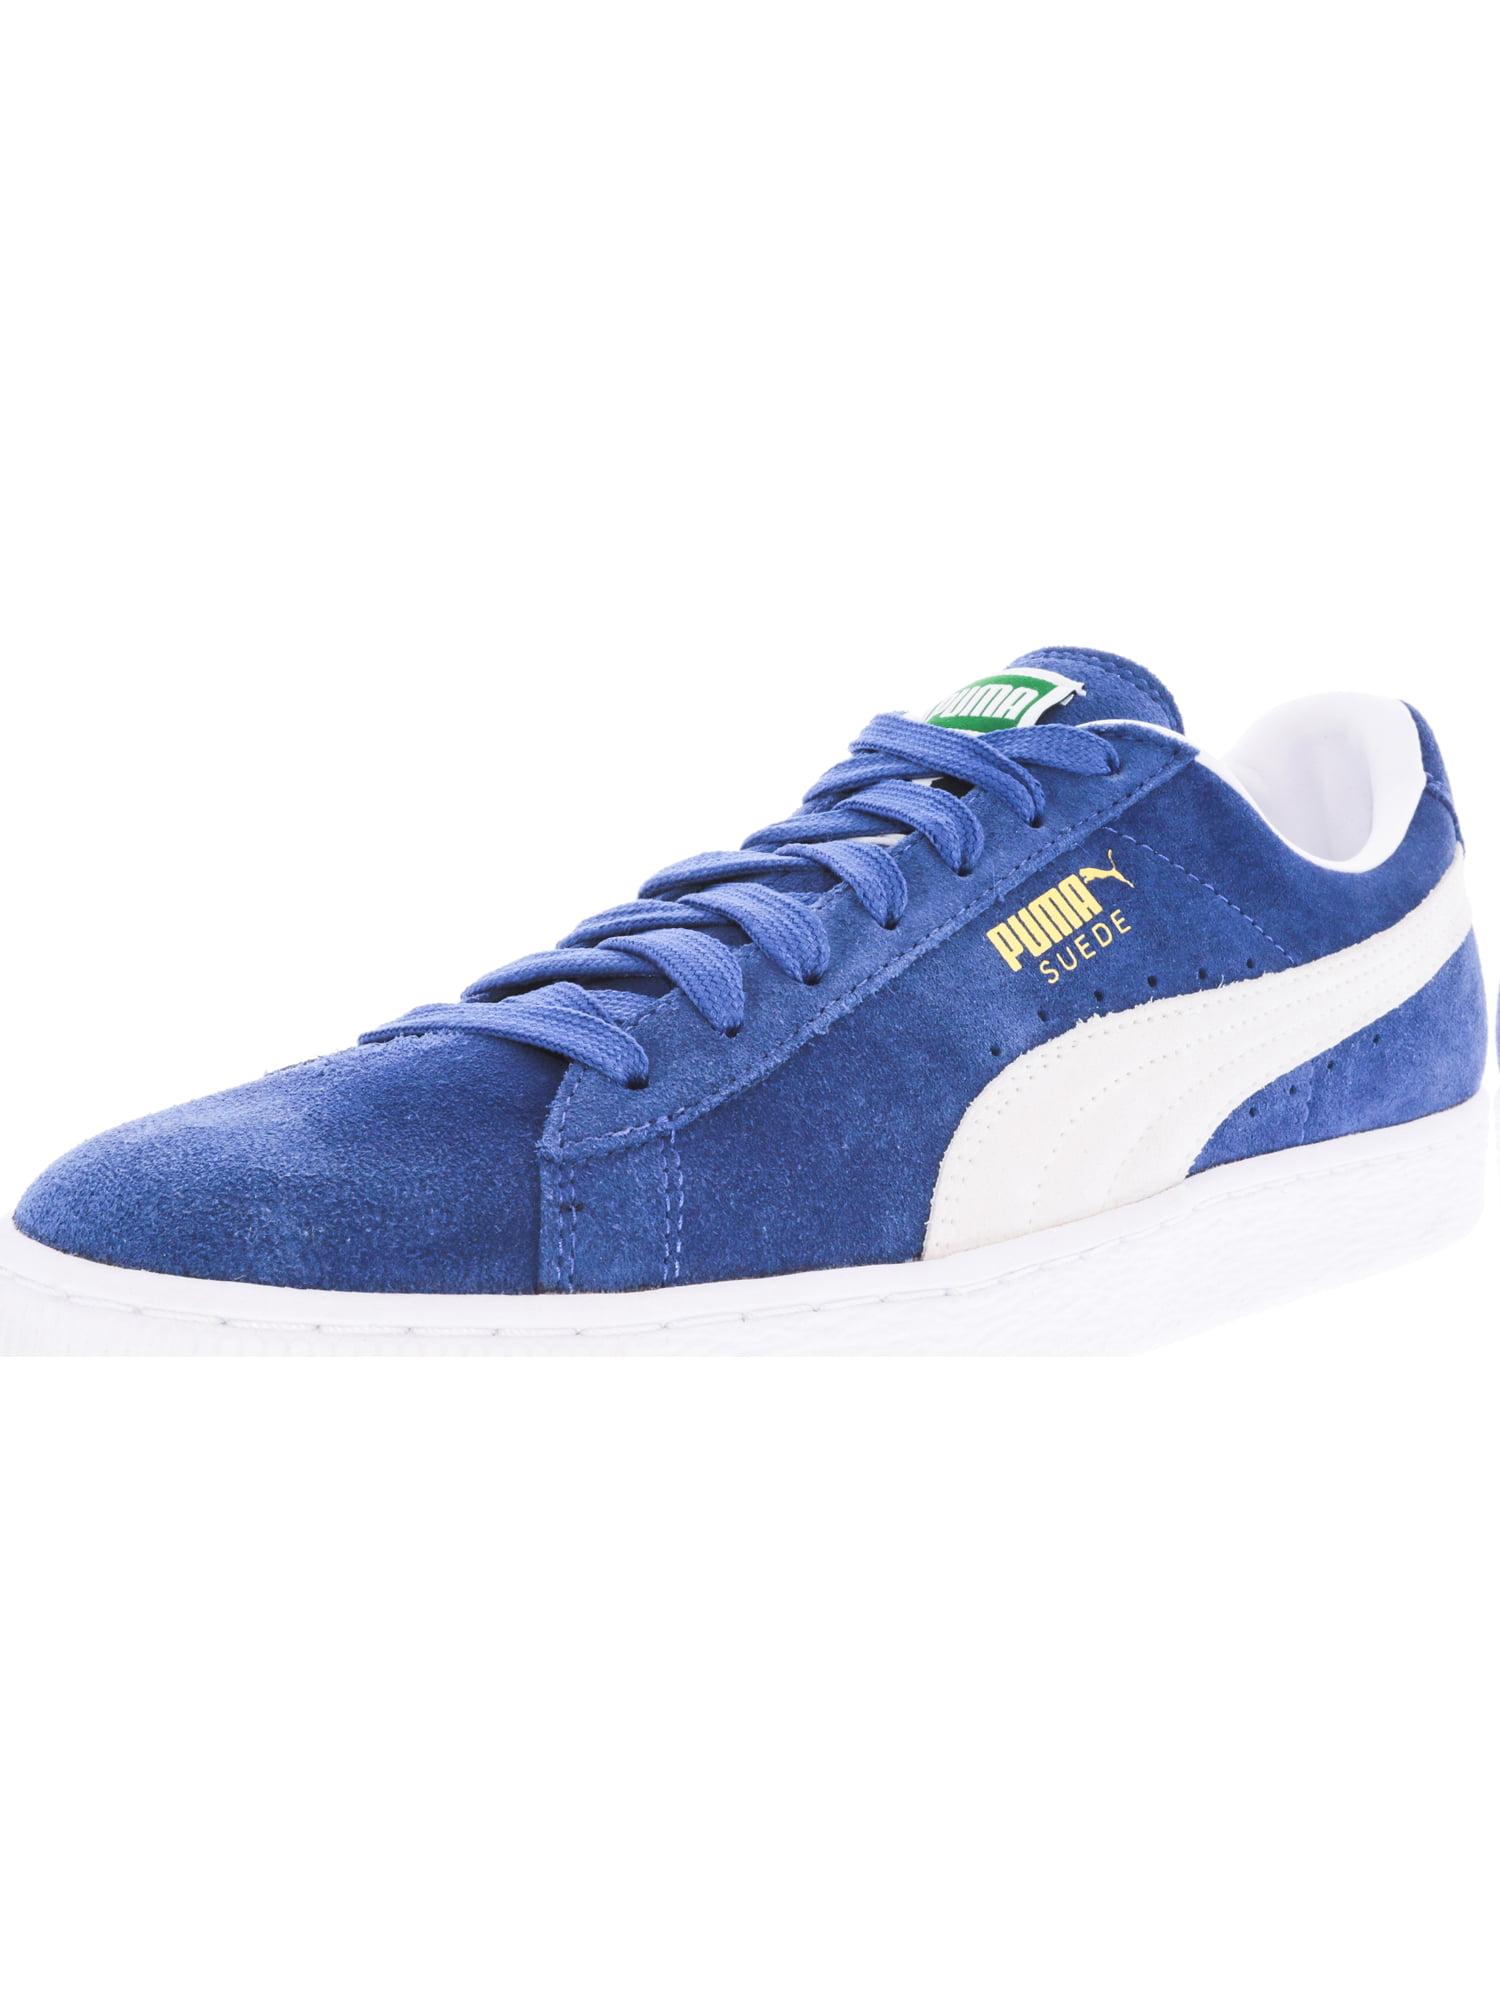 Puma Men's Suede Classic Olympian Blue